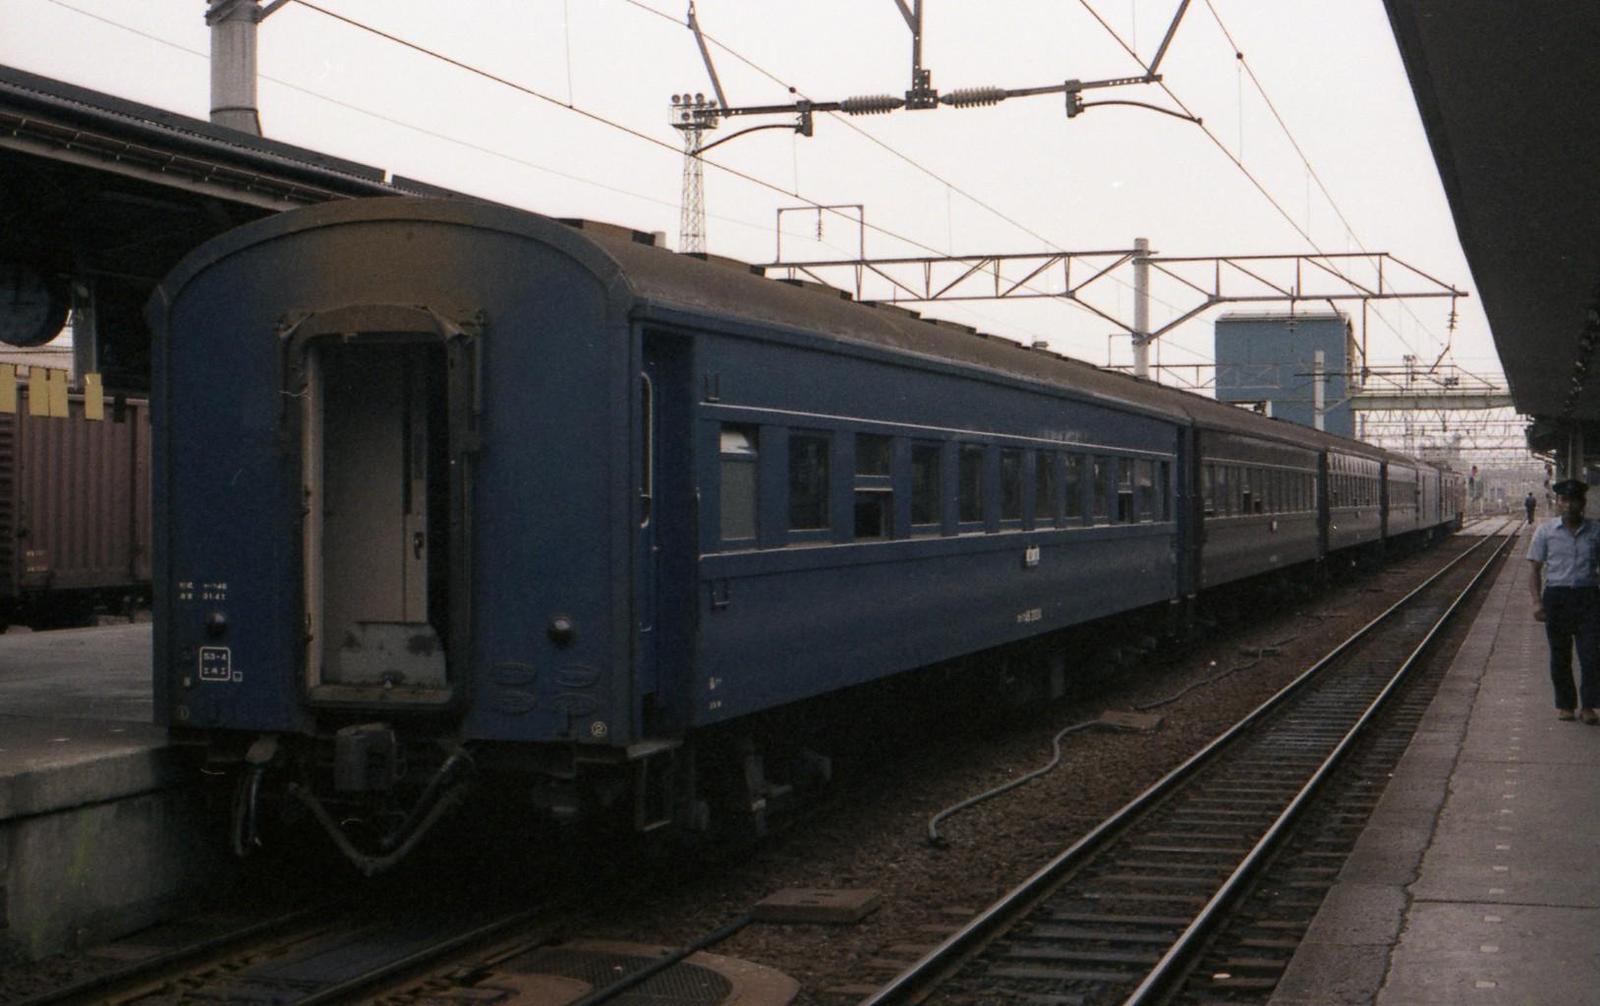 197810050624